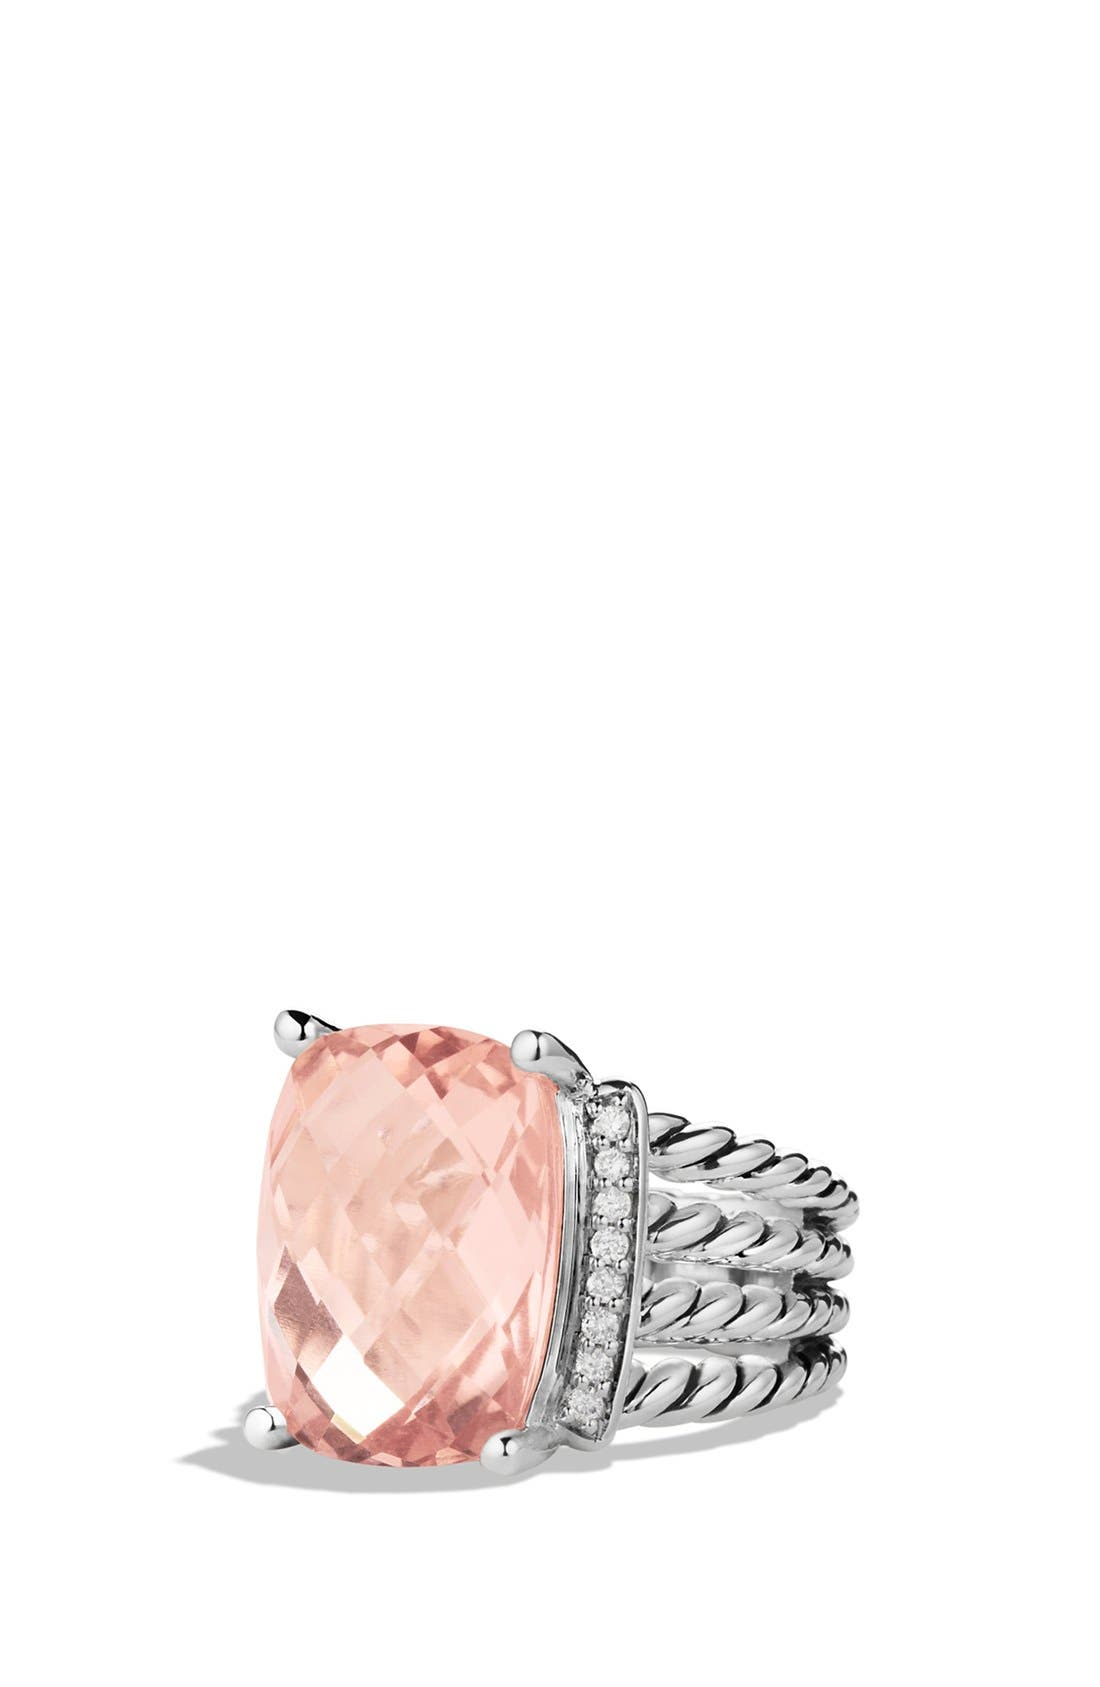 Main Image - David Yurman 'Wheaton' Ring with Semiprecious Stone & Diamonds